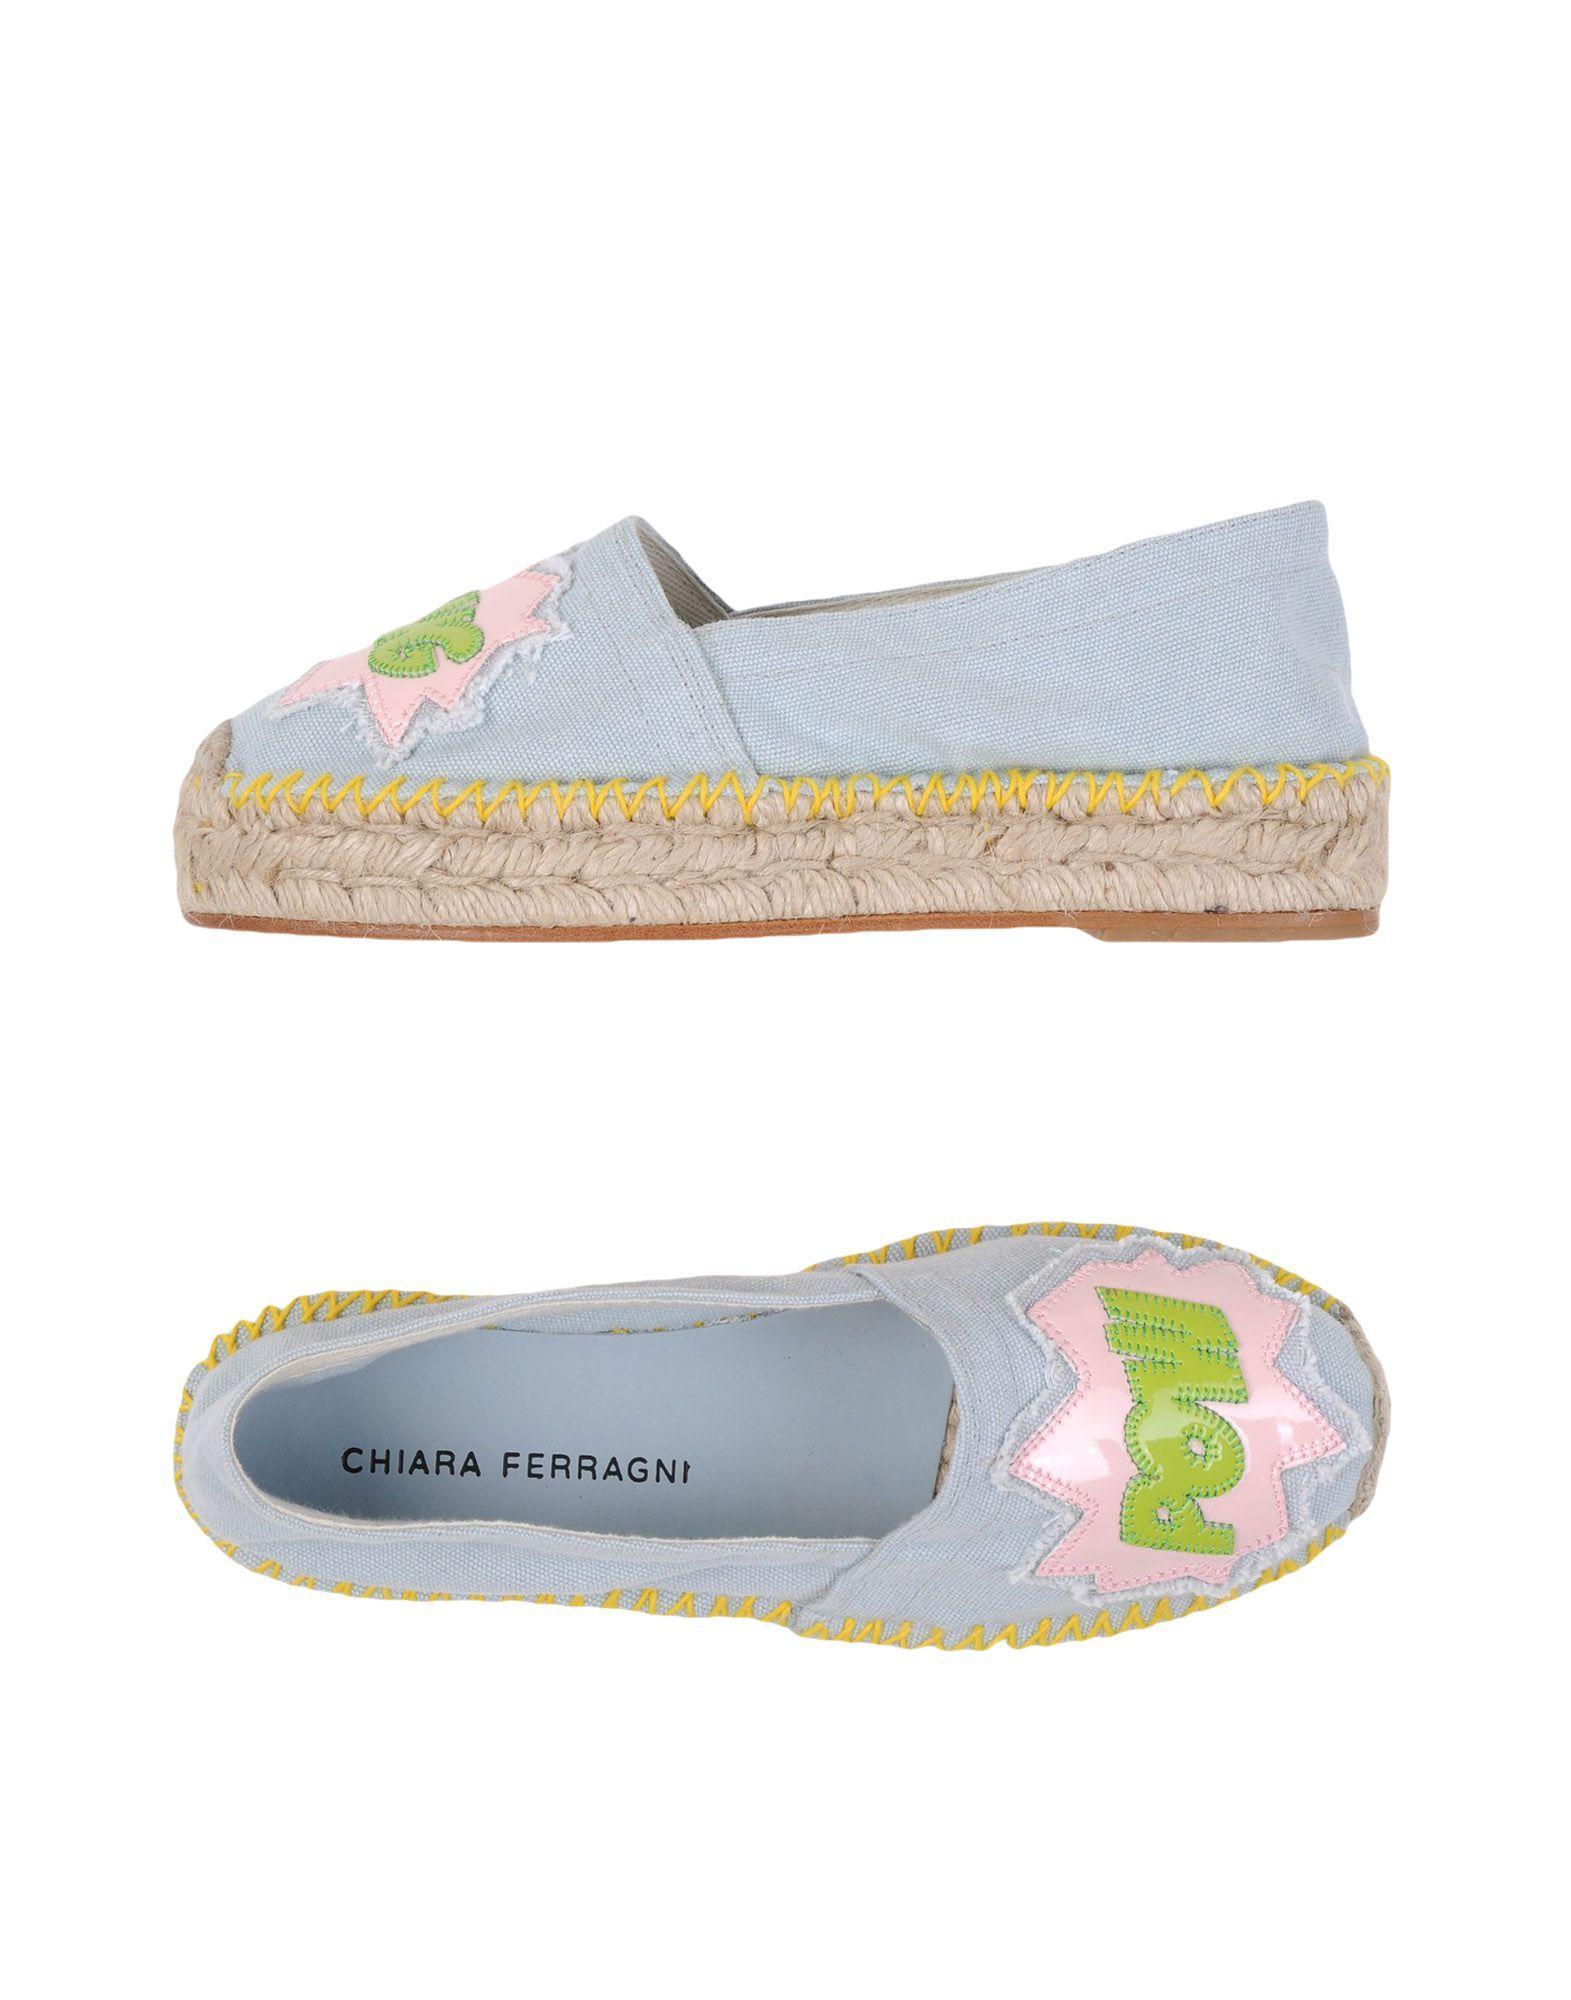 Stilvolle billige Schuhe Chiara Ferragni Espadrilles Espadrilles Espadrilles Damen  11118895UK fed781